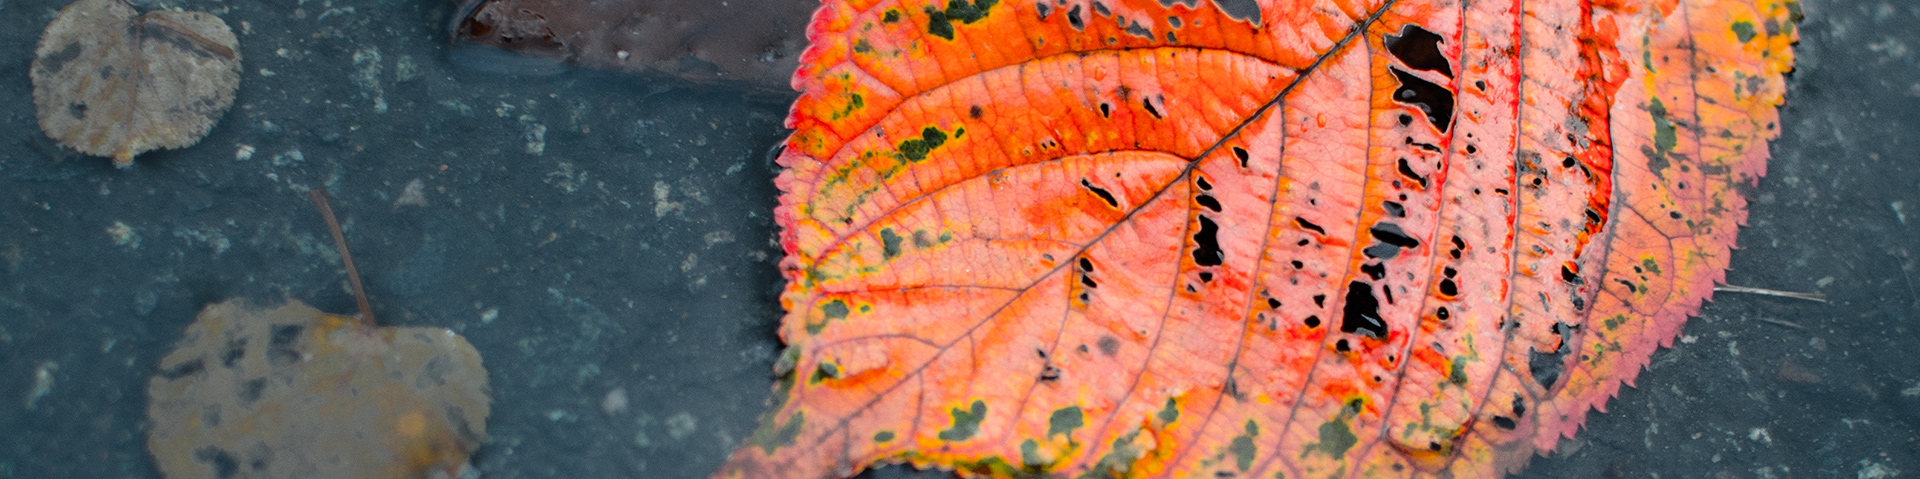 Höstlöv i regnet